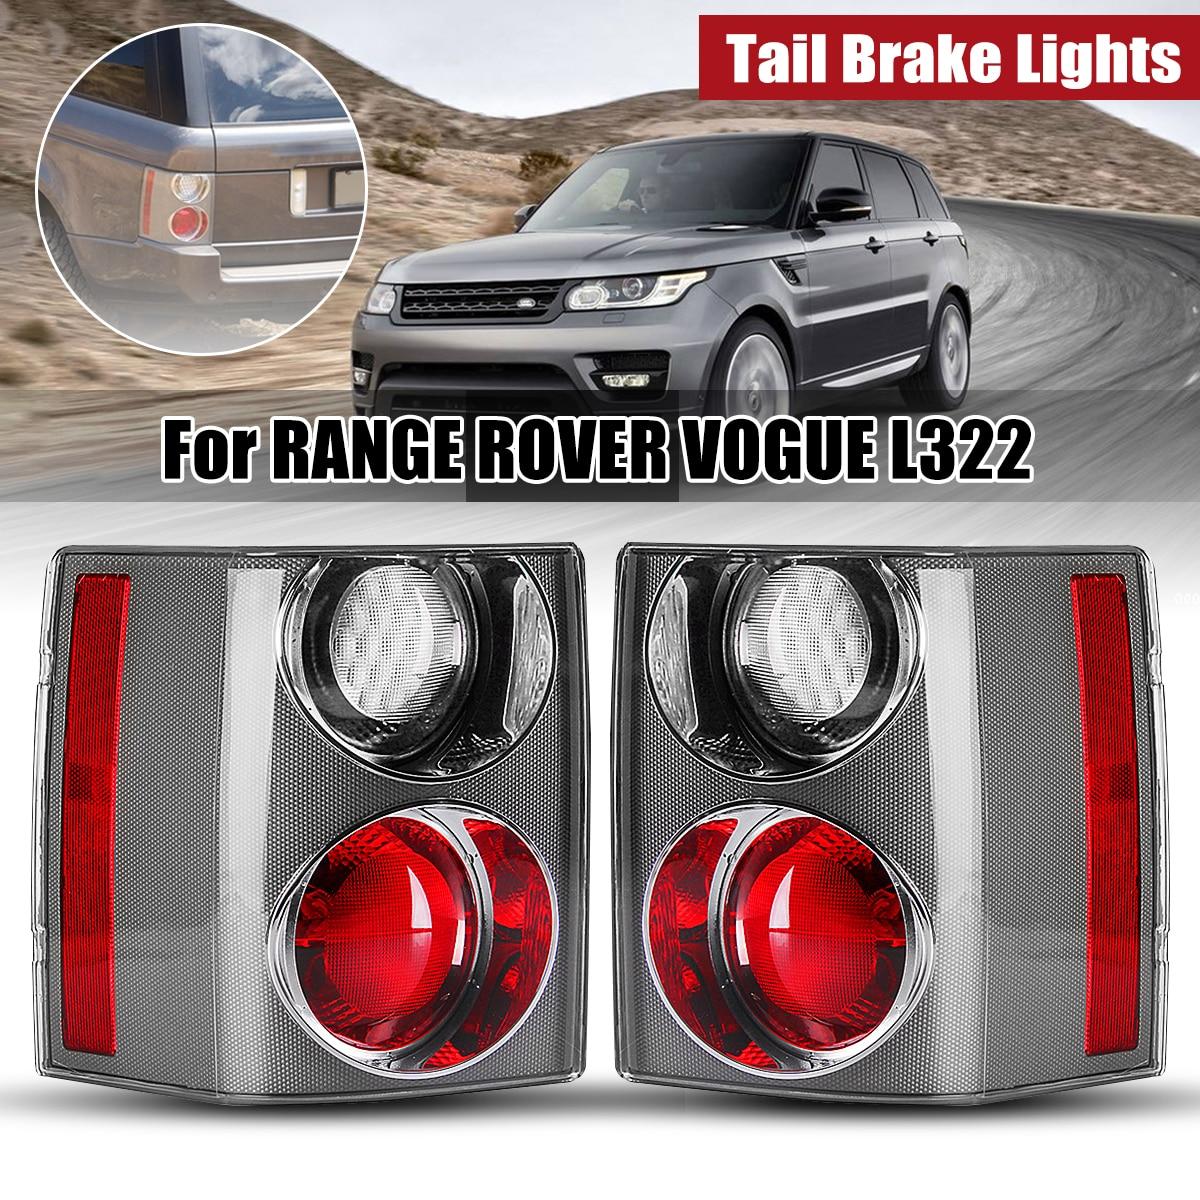 1 Pair Tail Brake Stop Light Rear Tail Brake Lights Fog Light Bumper Reflector For Land Rover Light RANGE VOGUE L322 2002 2009